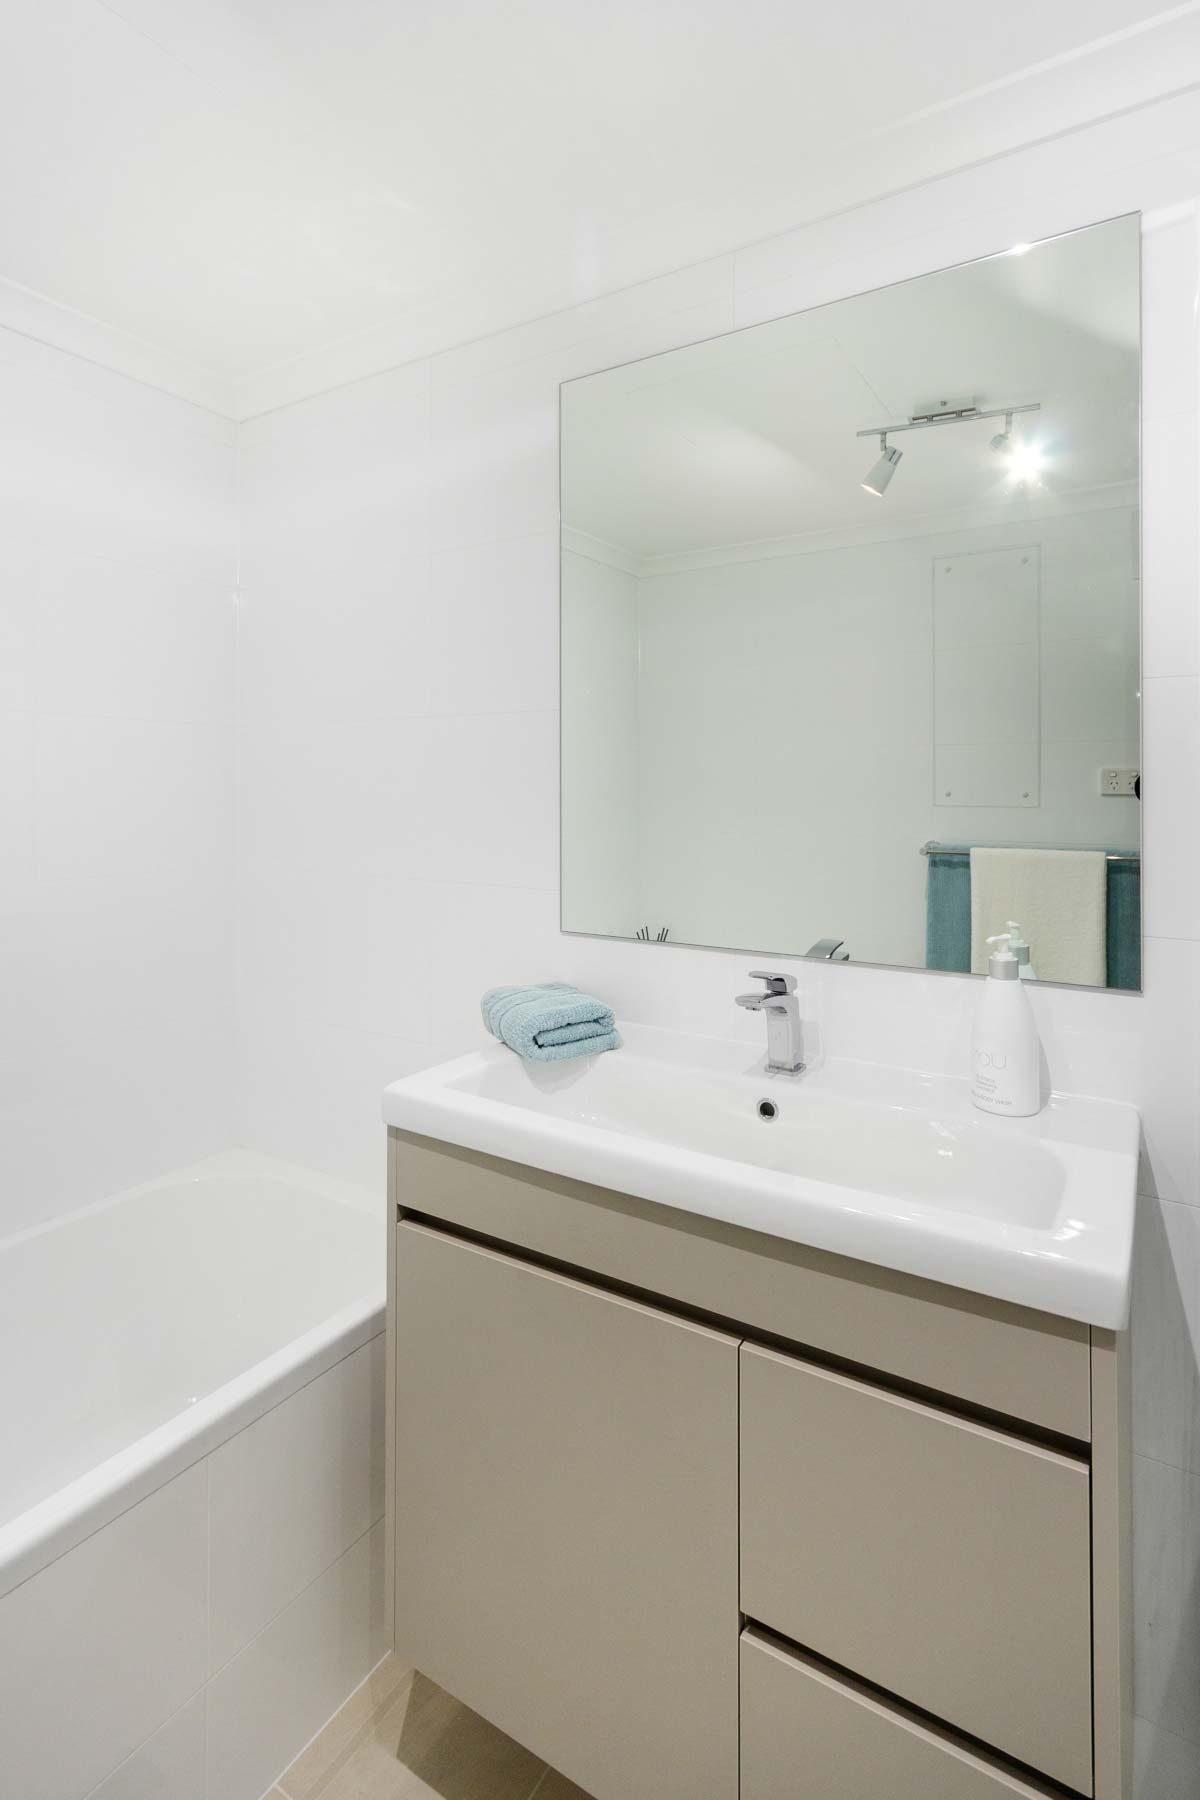 Apartment renovation bathroom by Reno Pack Sydney featuring custom made vanity